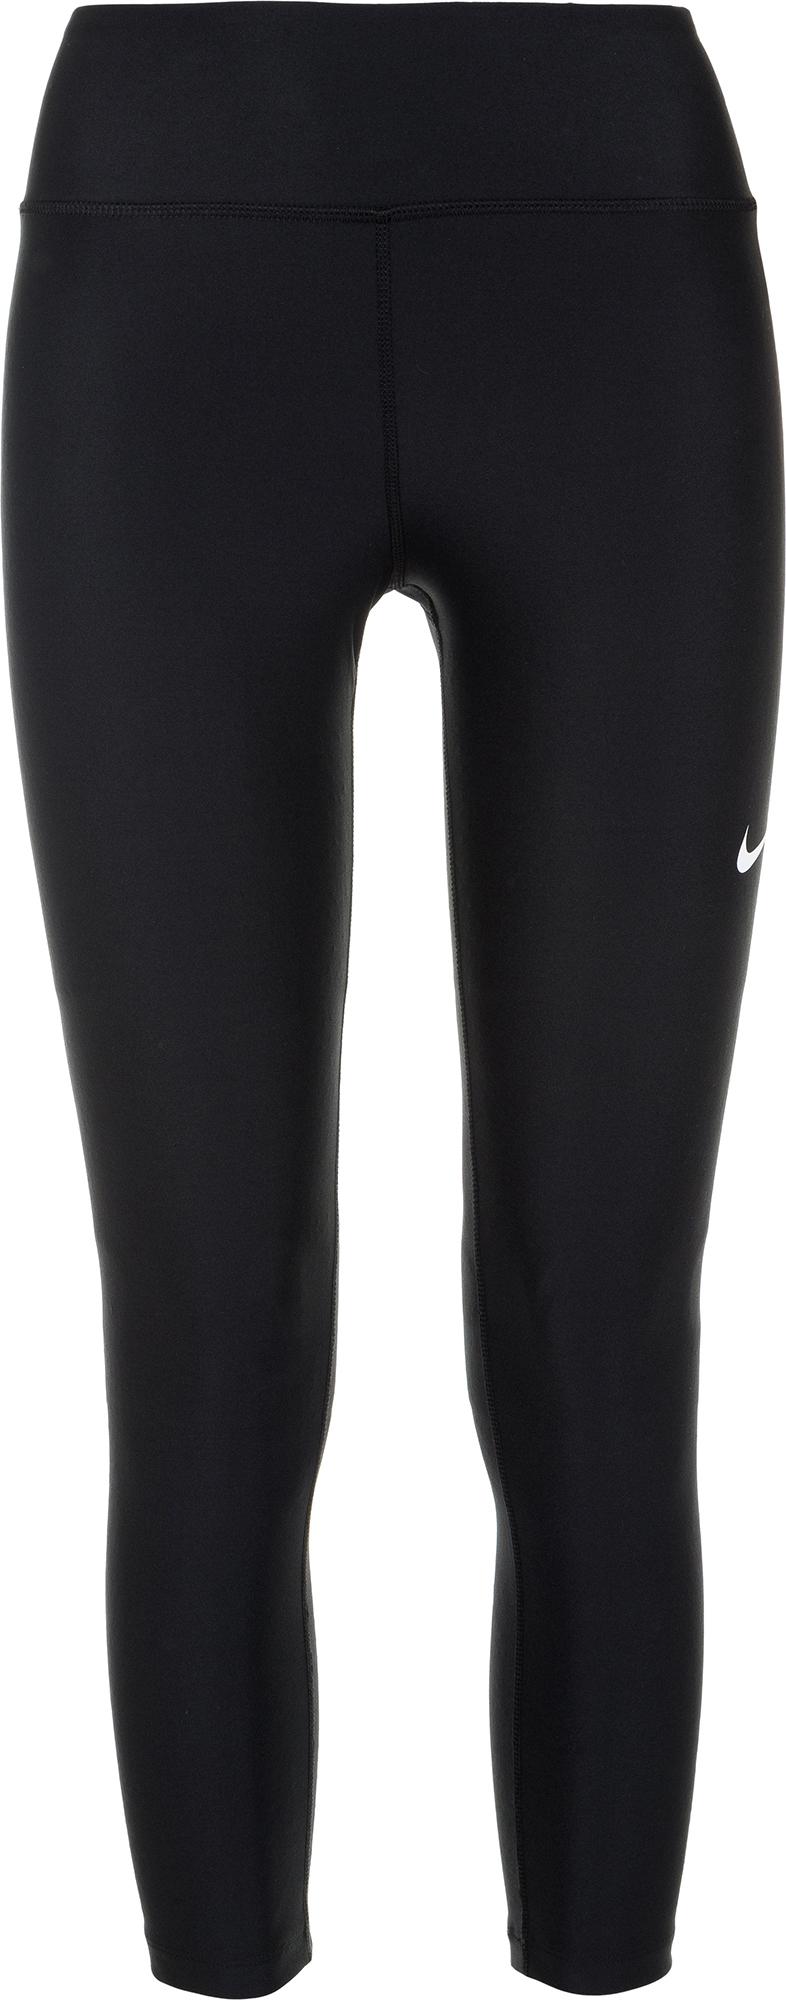 Nike Бриджи женские Nike Power Victory, размер 48-50